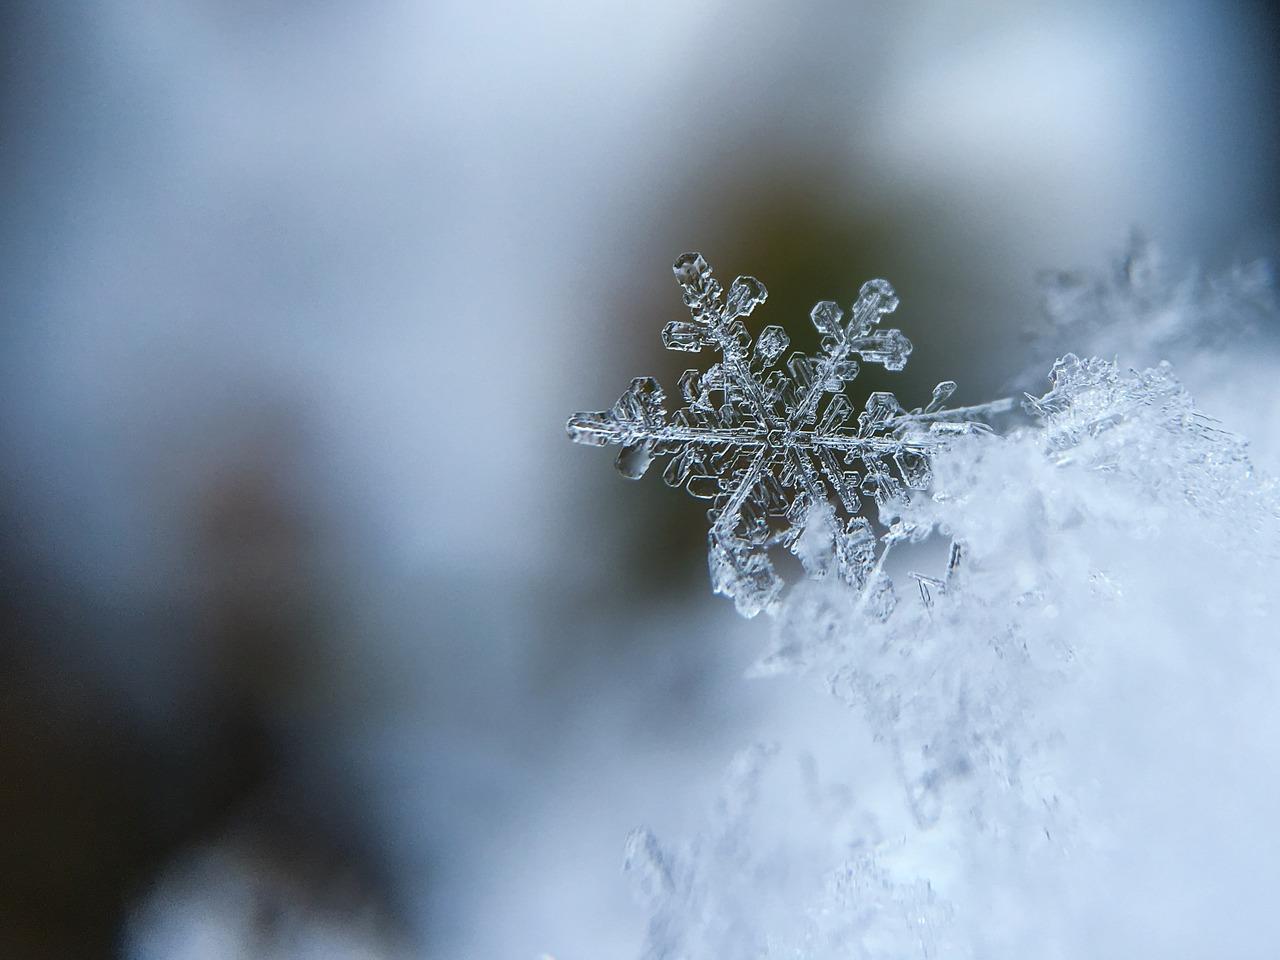 Woordspel - sneeuwvlok